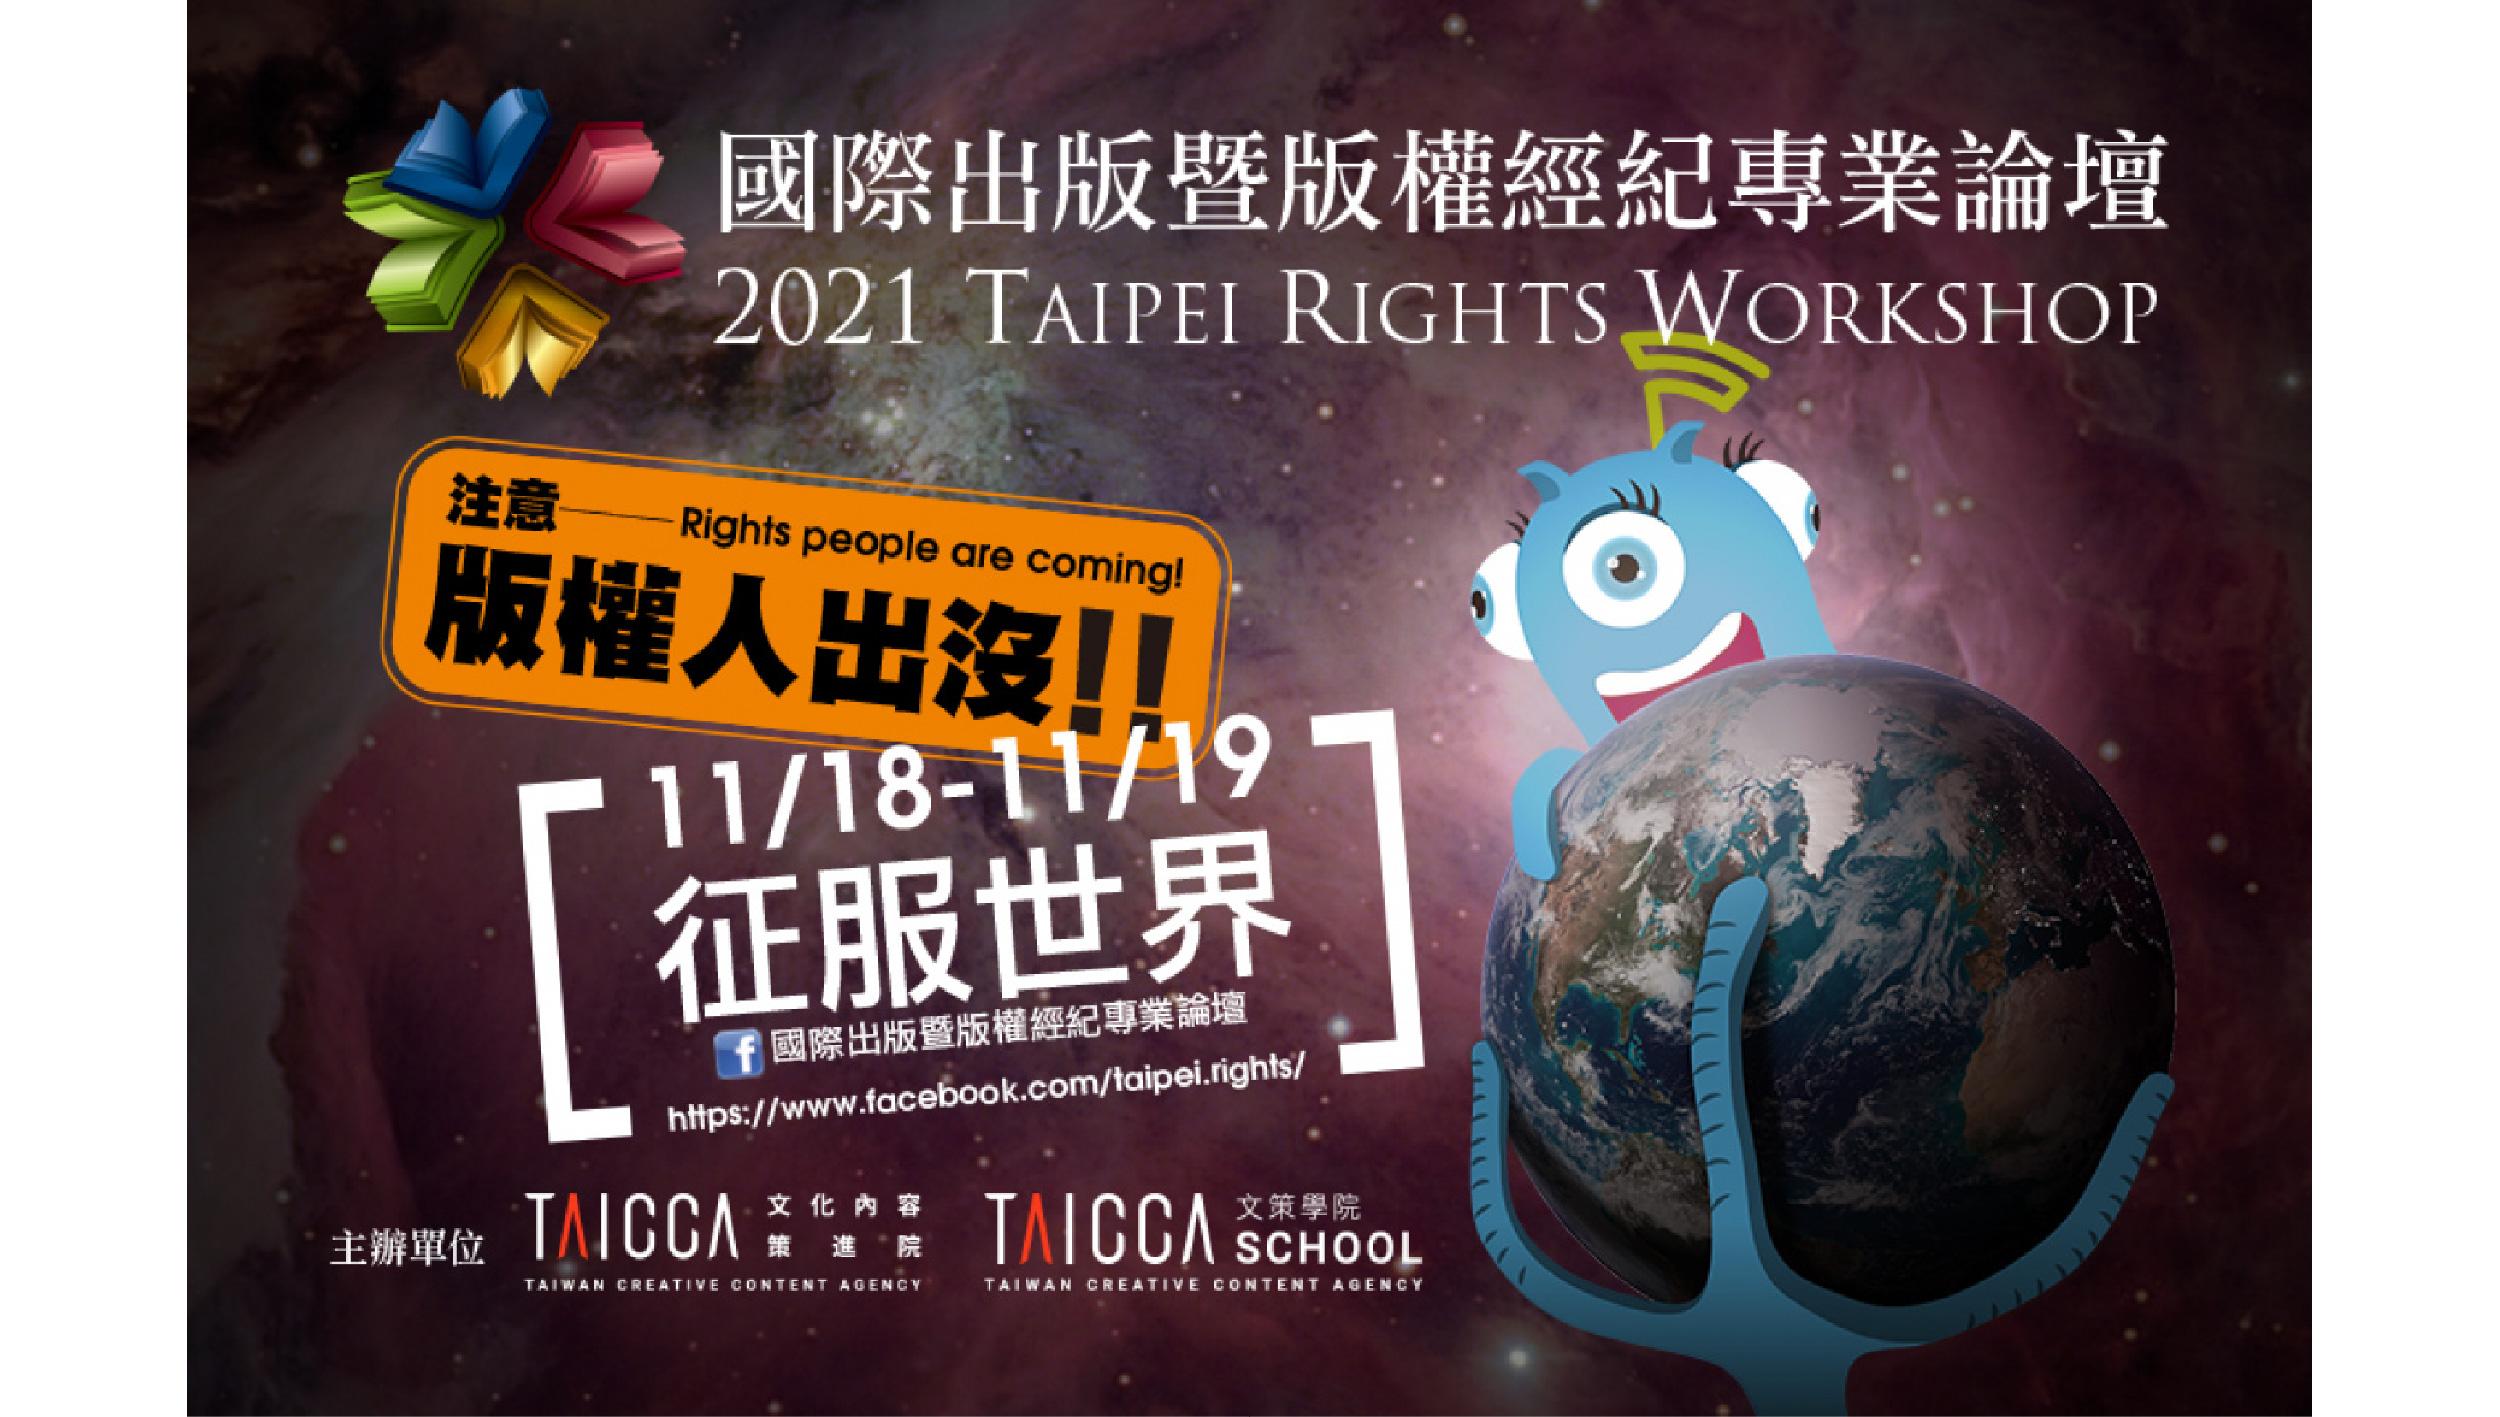 【TAICCA 文策學院】2021國際出版暨版權經紀線上專業論壇及工作坊